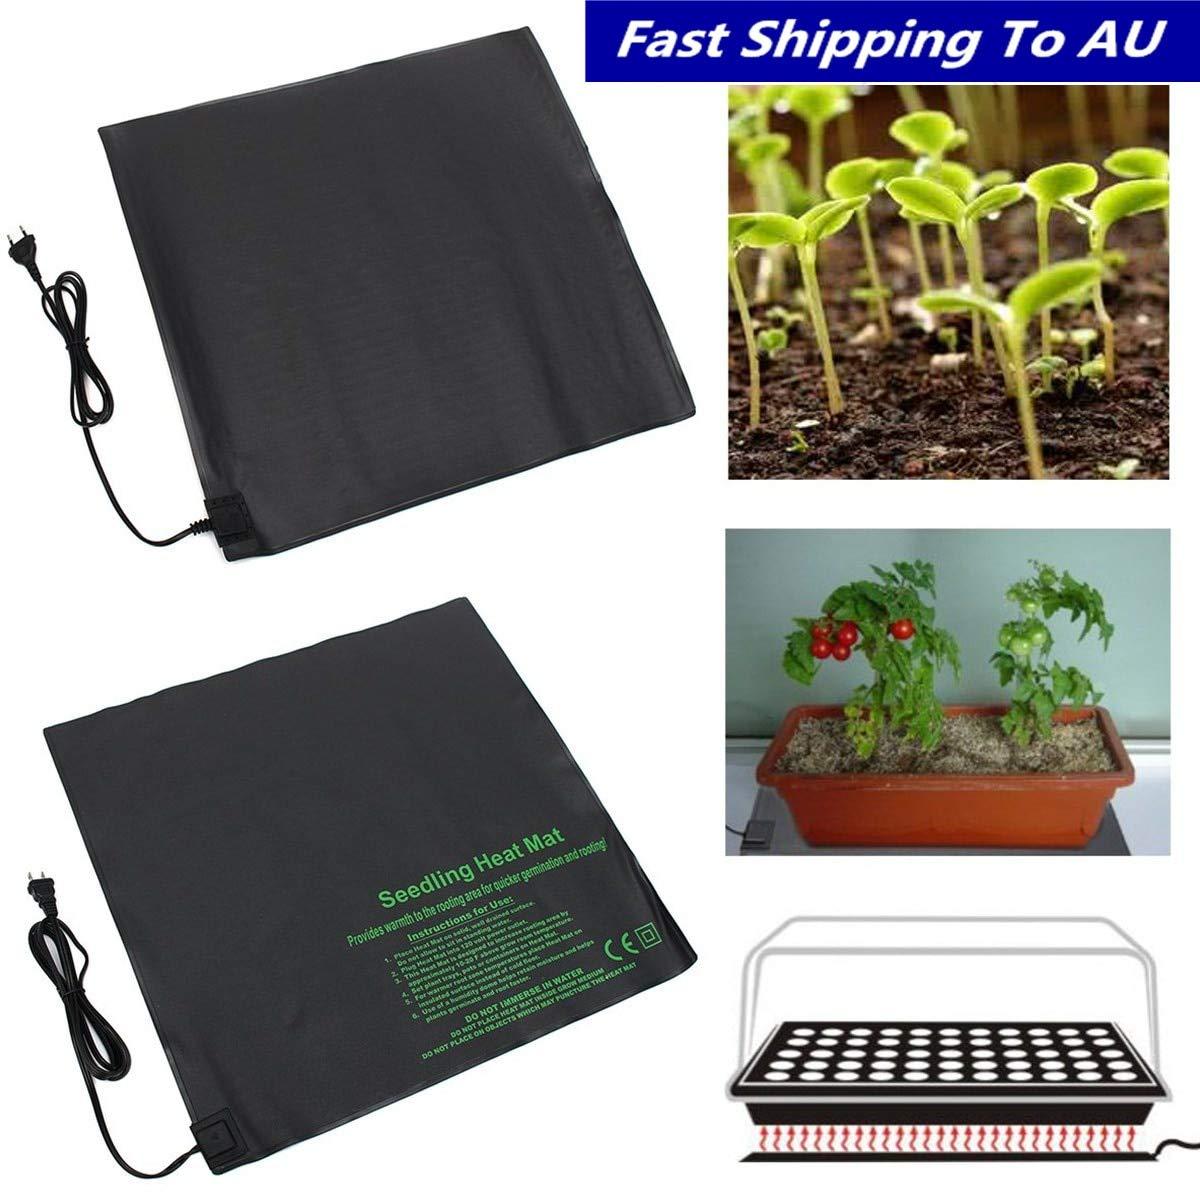 TOYECOTA - 52x52cm 110V/220V Seedling Heating Mat Waterproof Plant Seed Germination Propagation Clone Starter Pad Garden Supplies EU USPlug